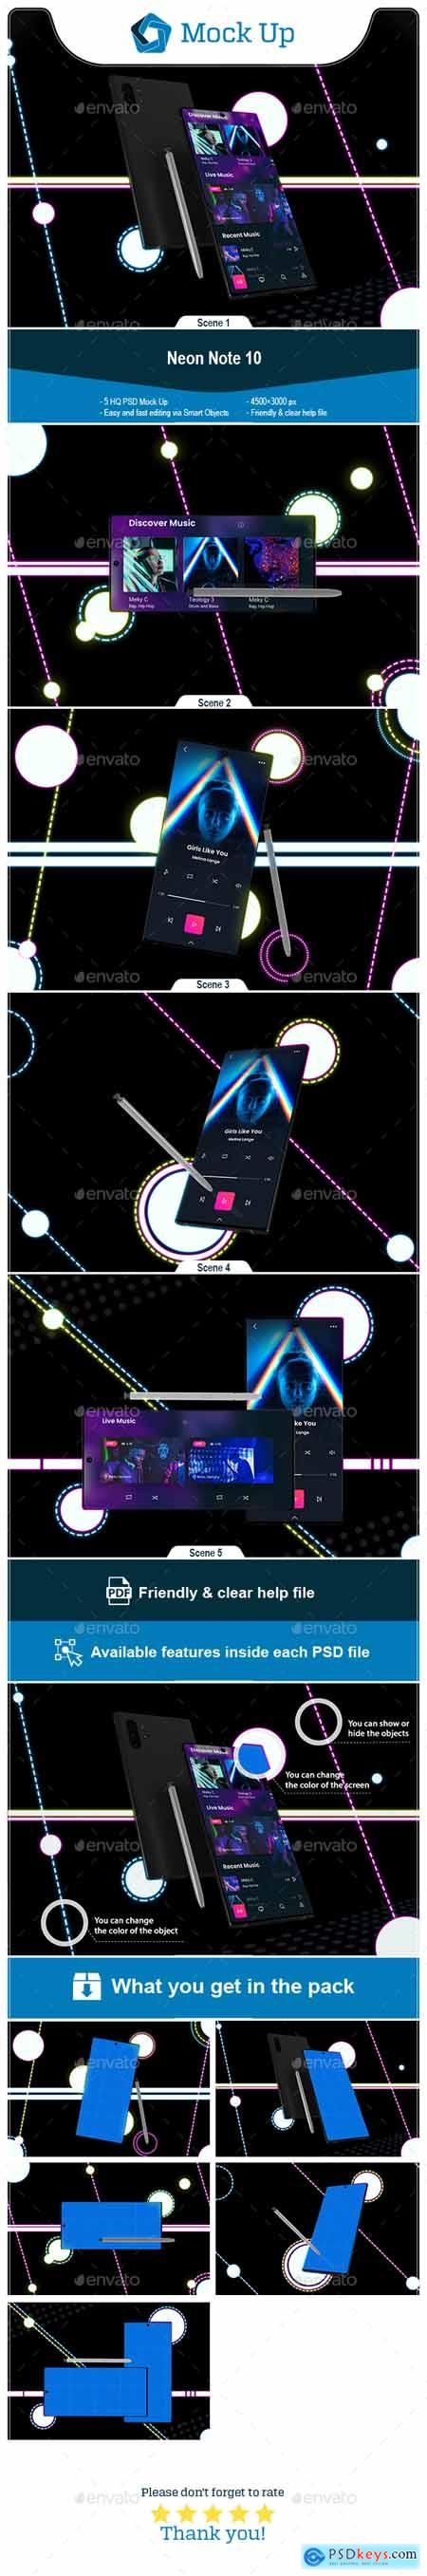 Neon Note 10 MockUp 24696870